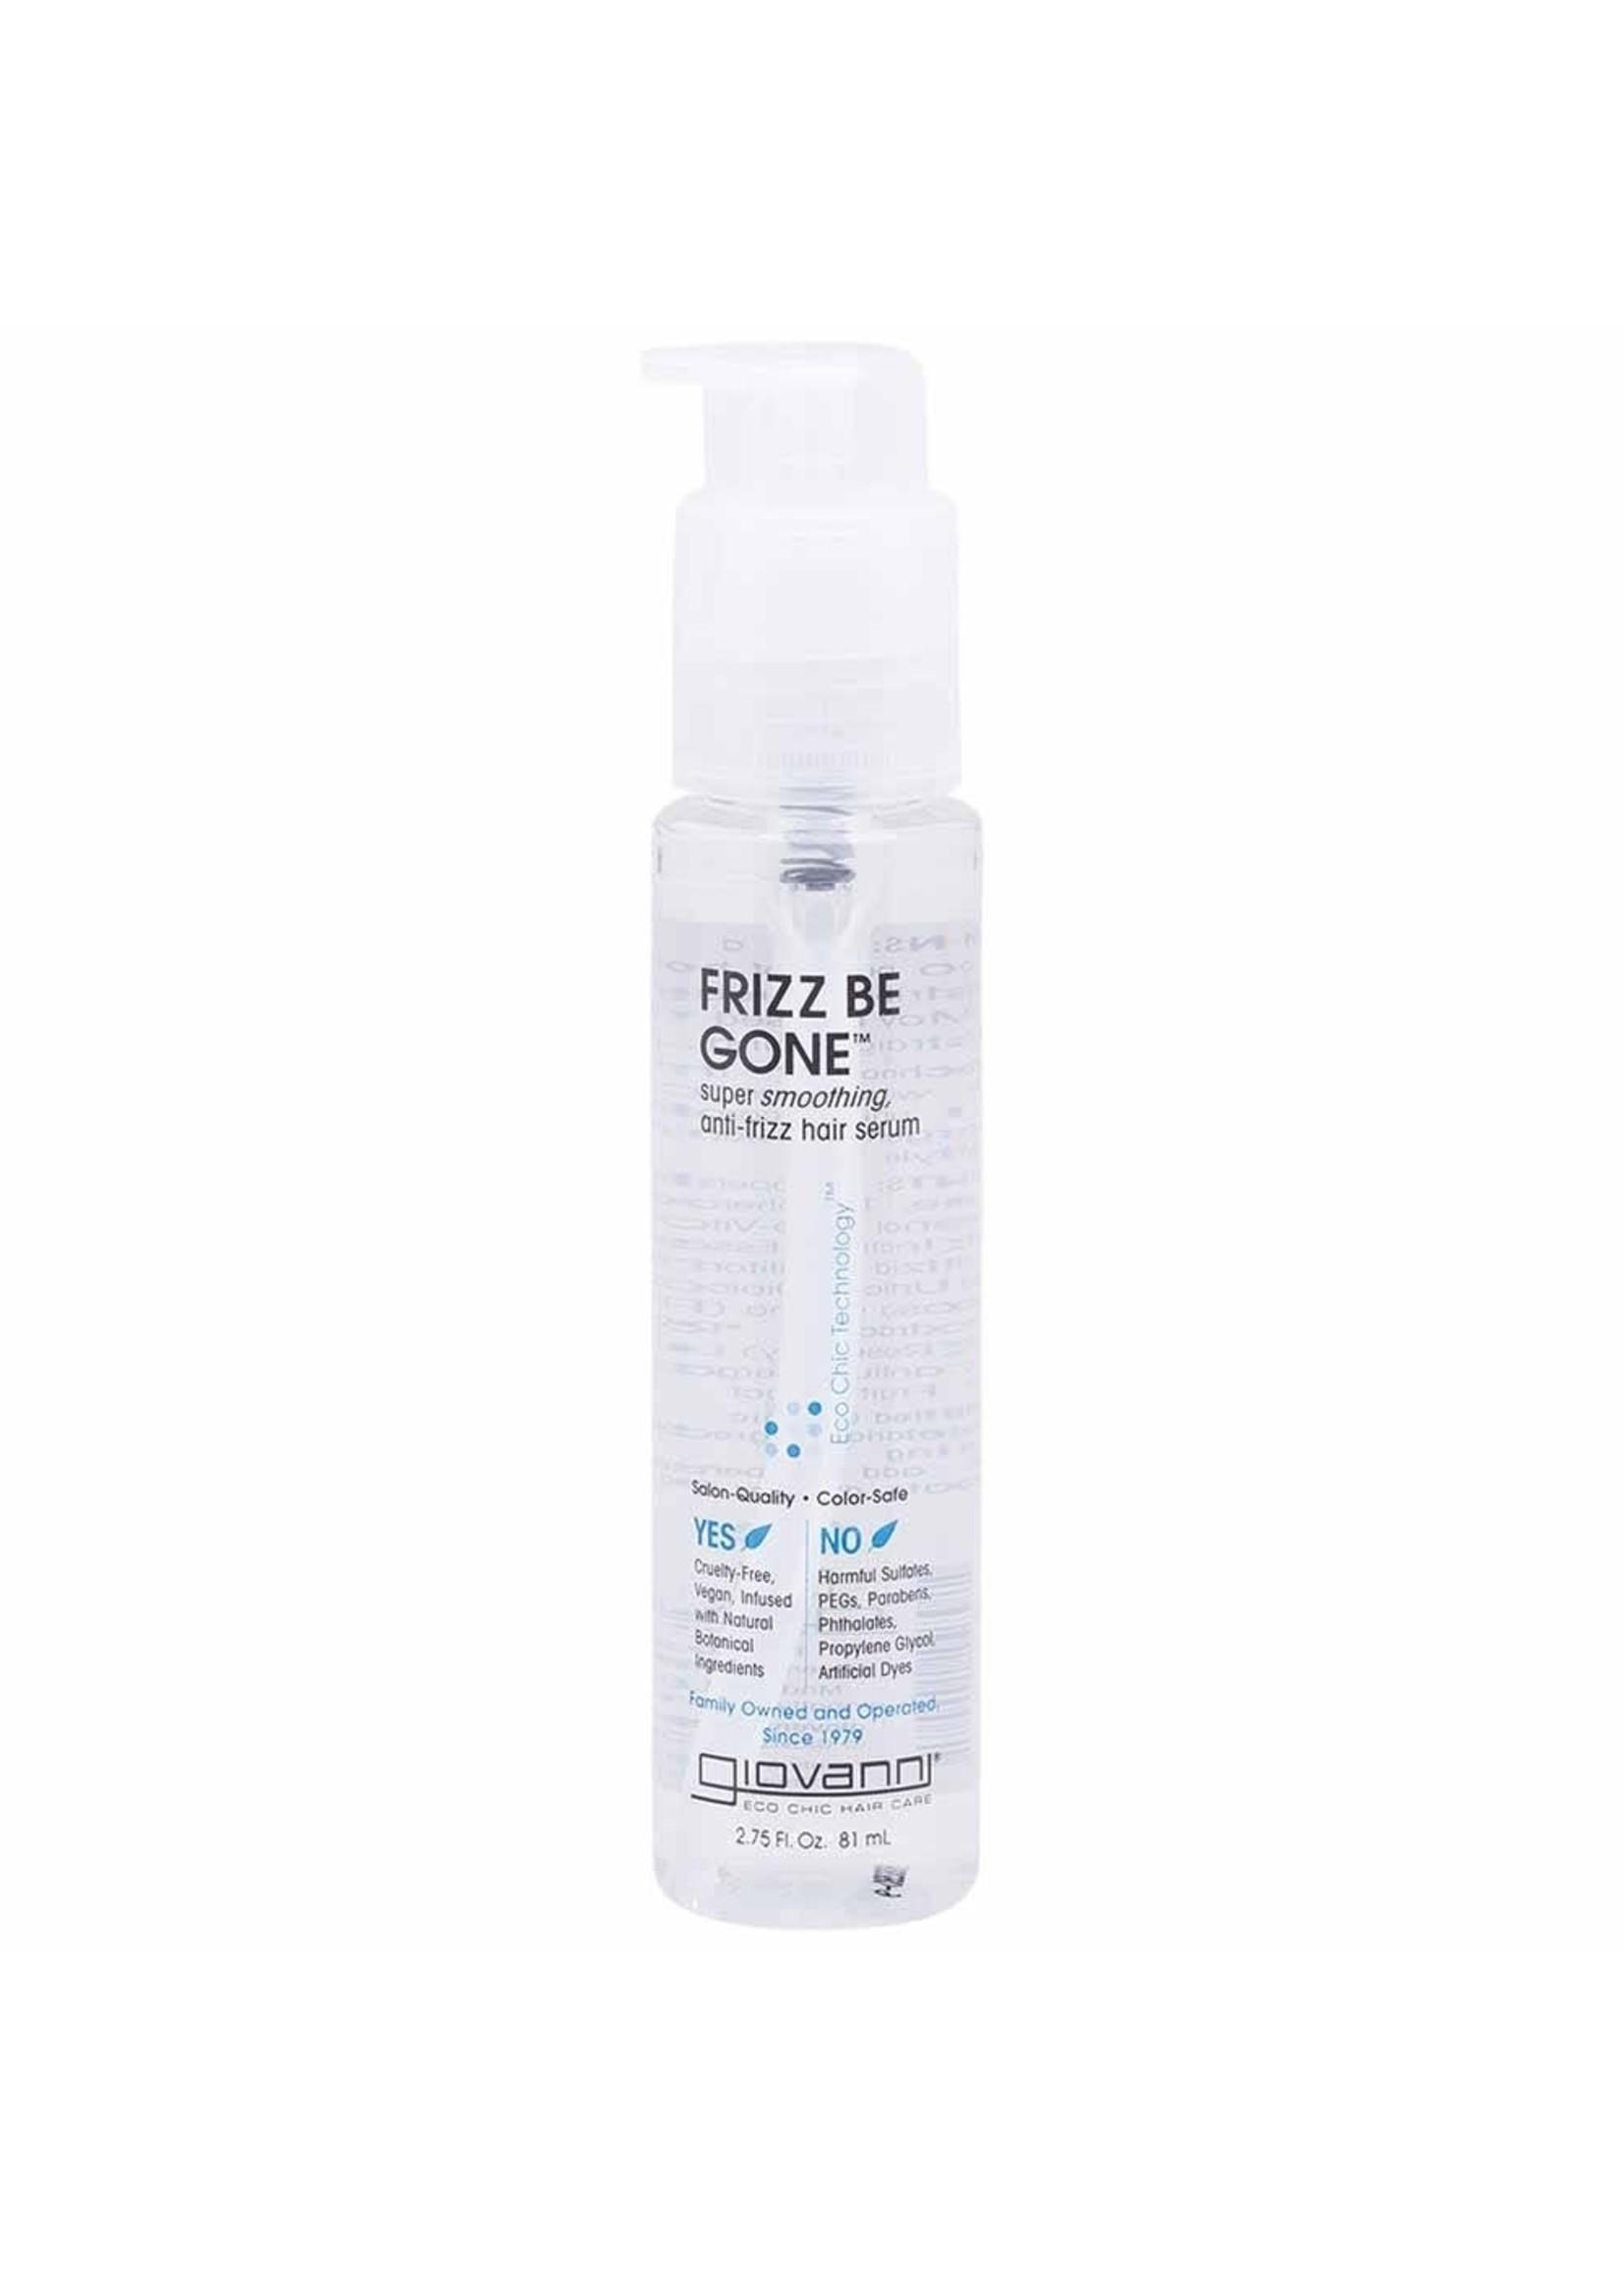 Giovanni Frizz Be Gone Super Smooth Anti Frizz Hair Serum